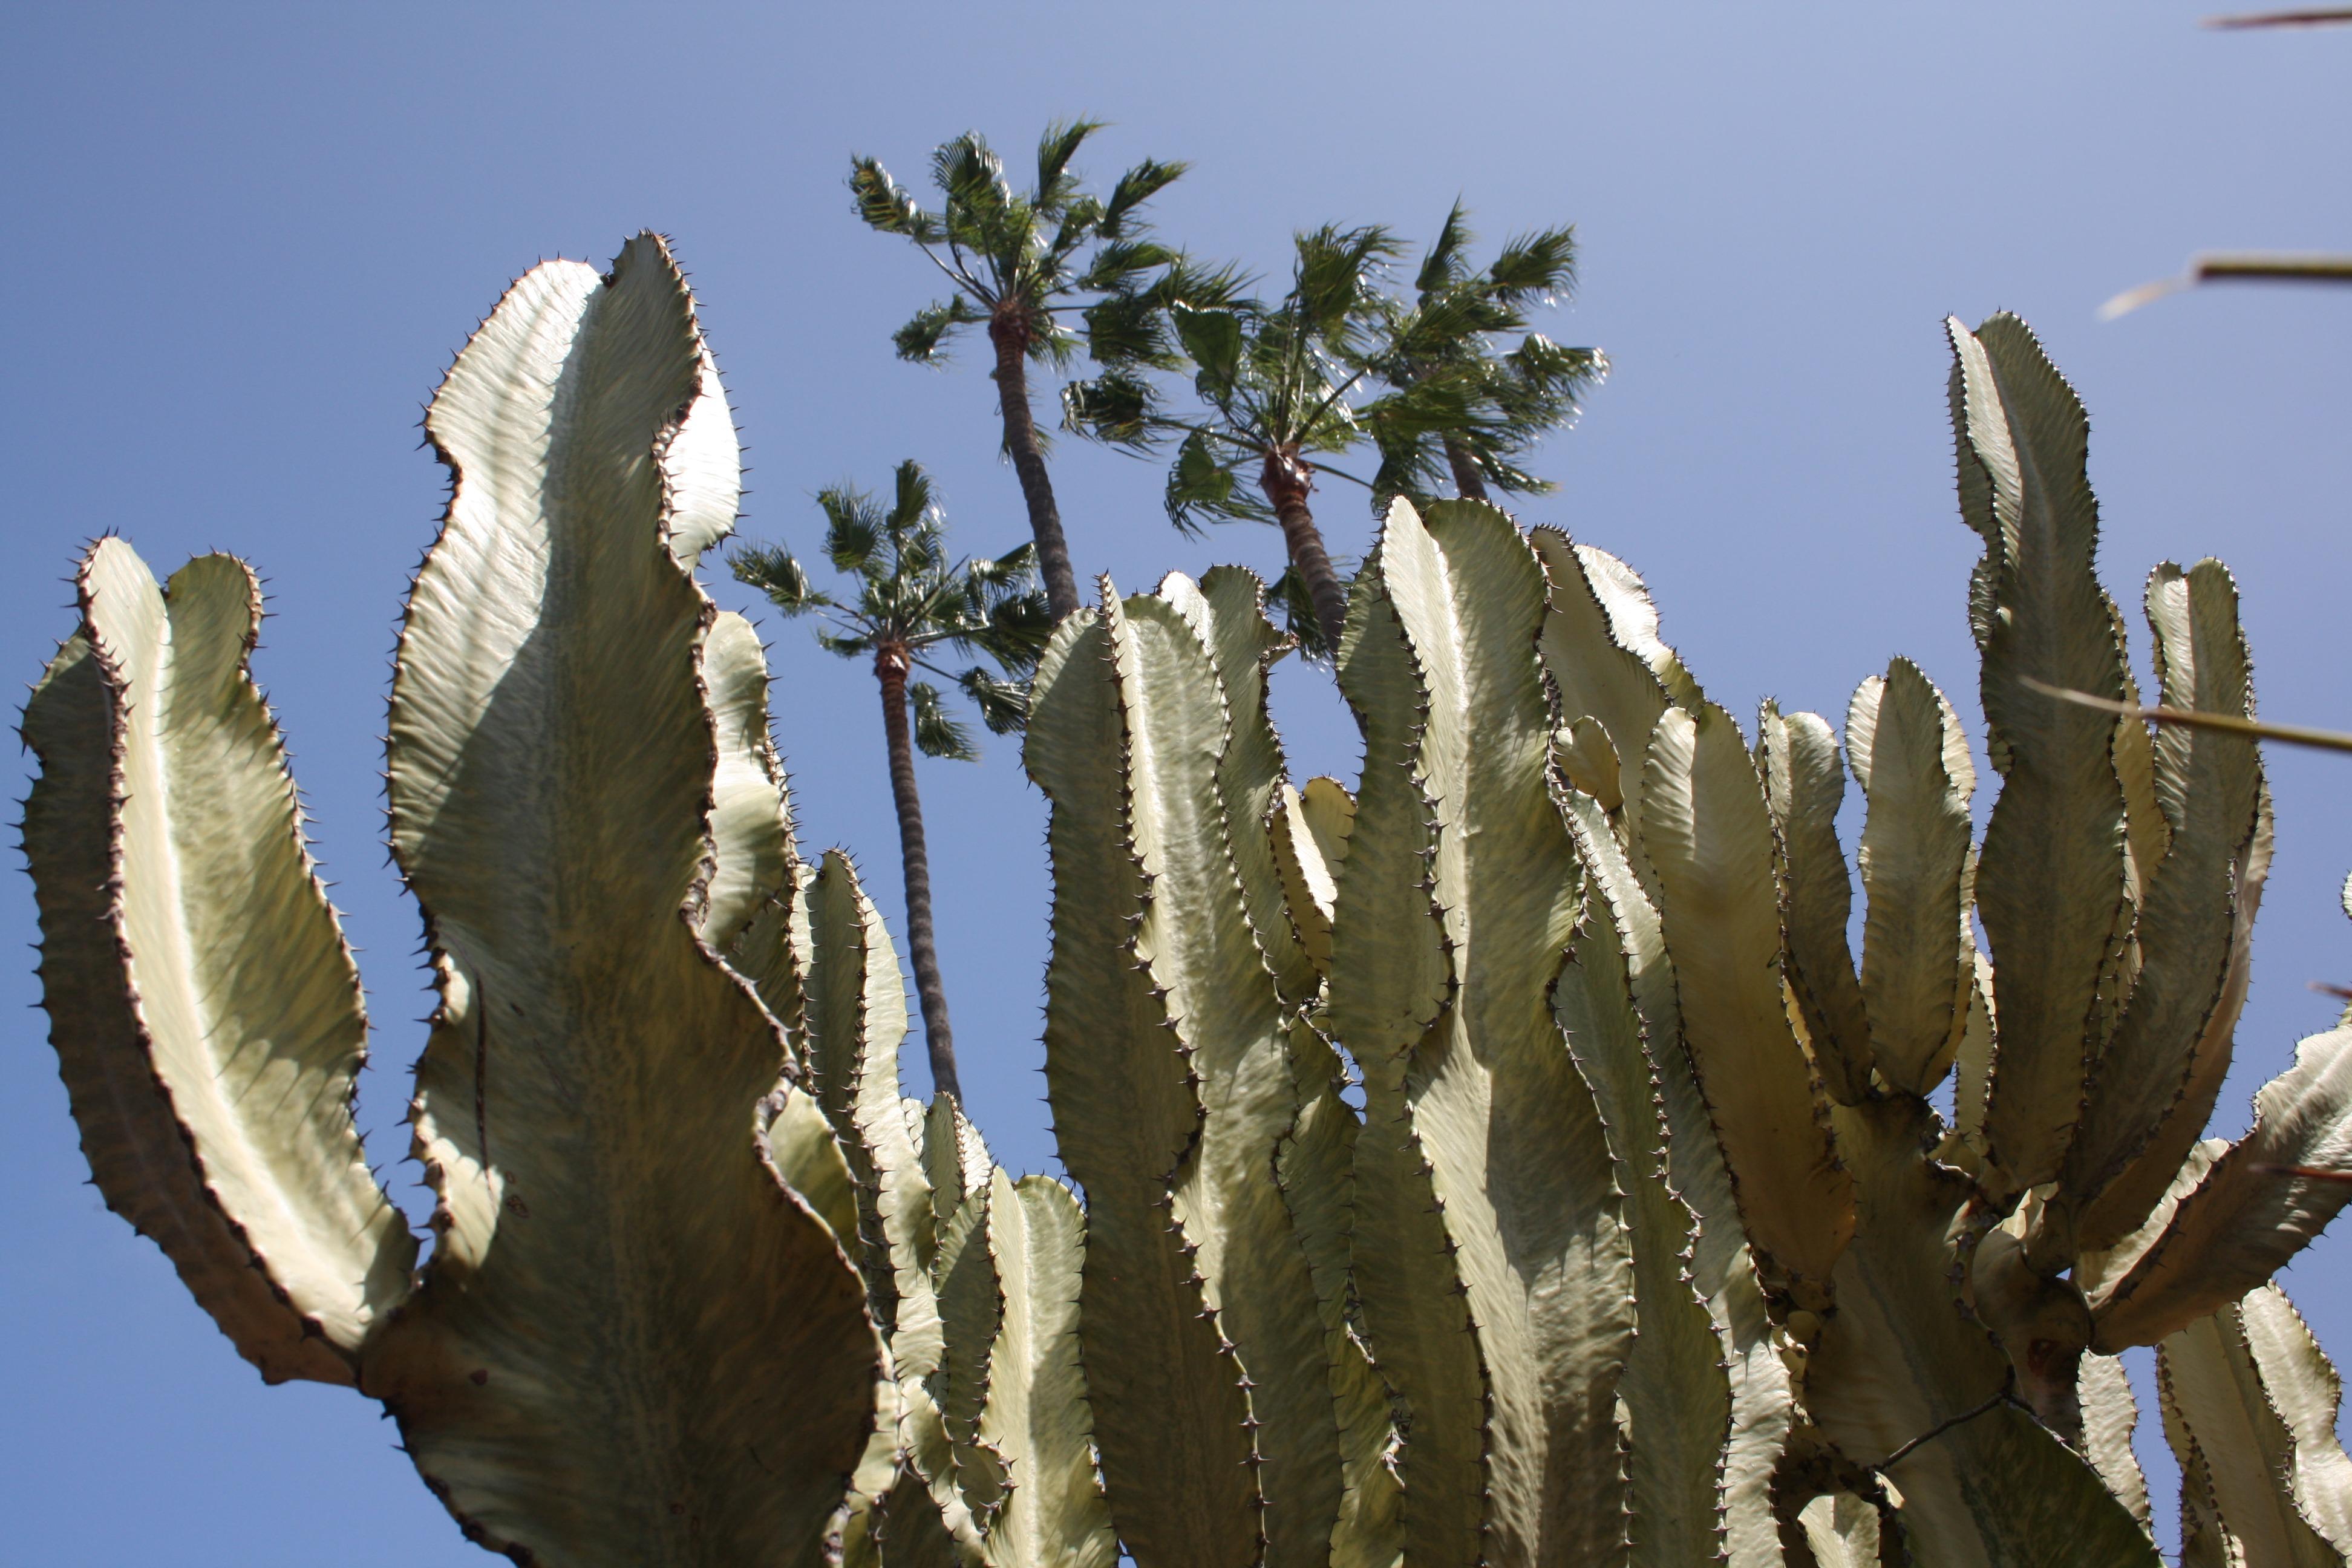 Free Cactus and Palm trees Stock Photo - FreeImages.com   Name Cactus Palm Tree